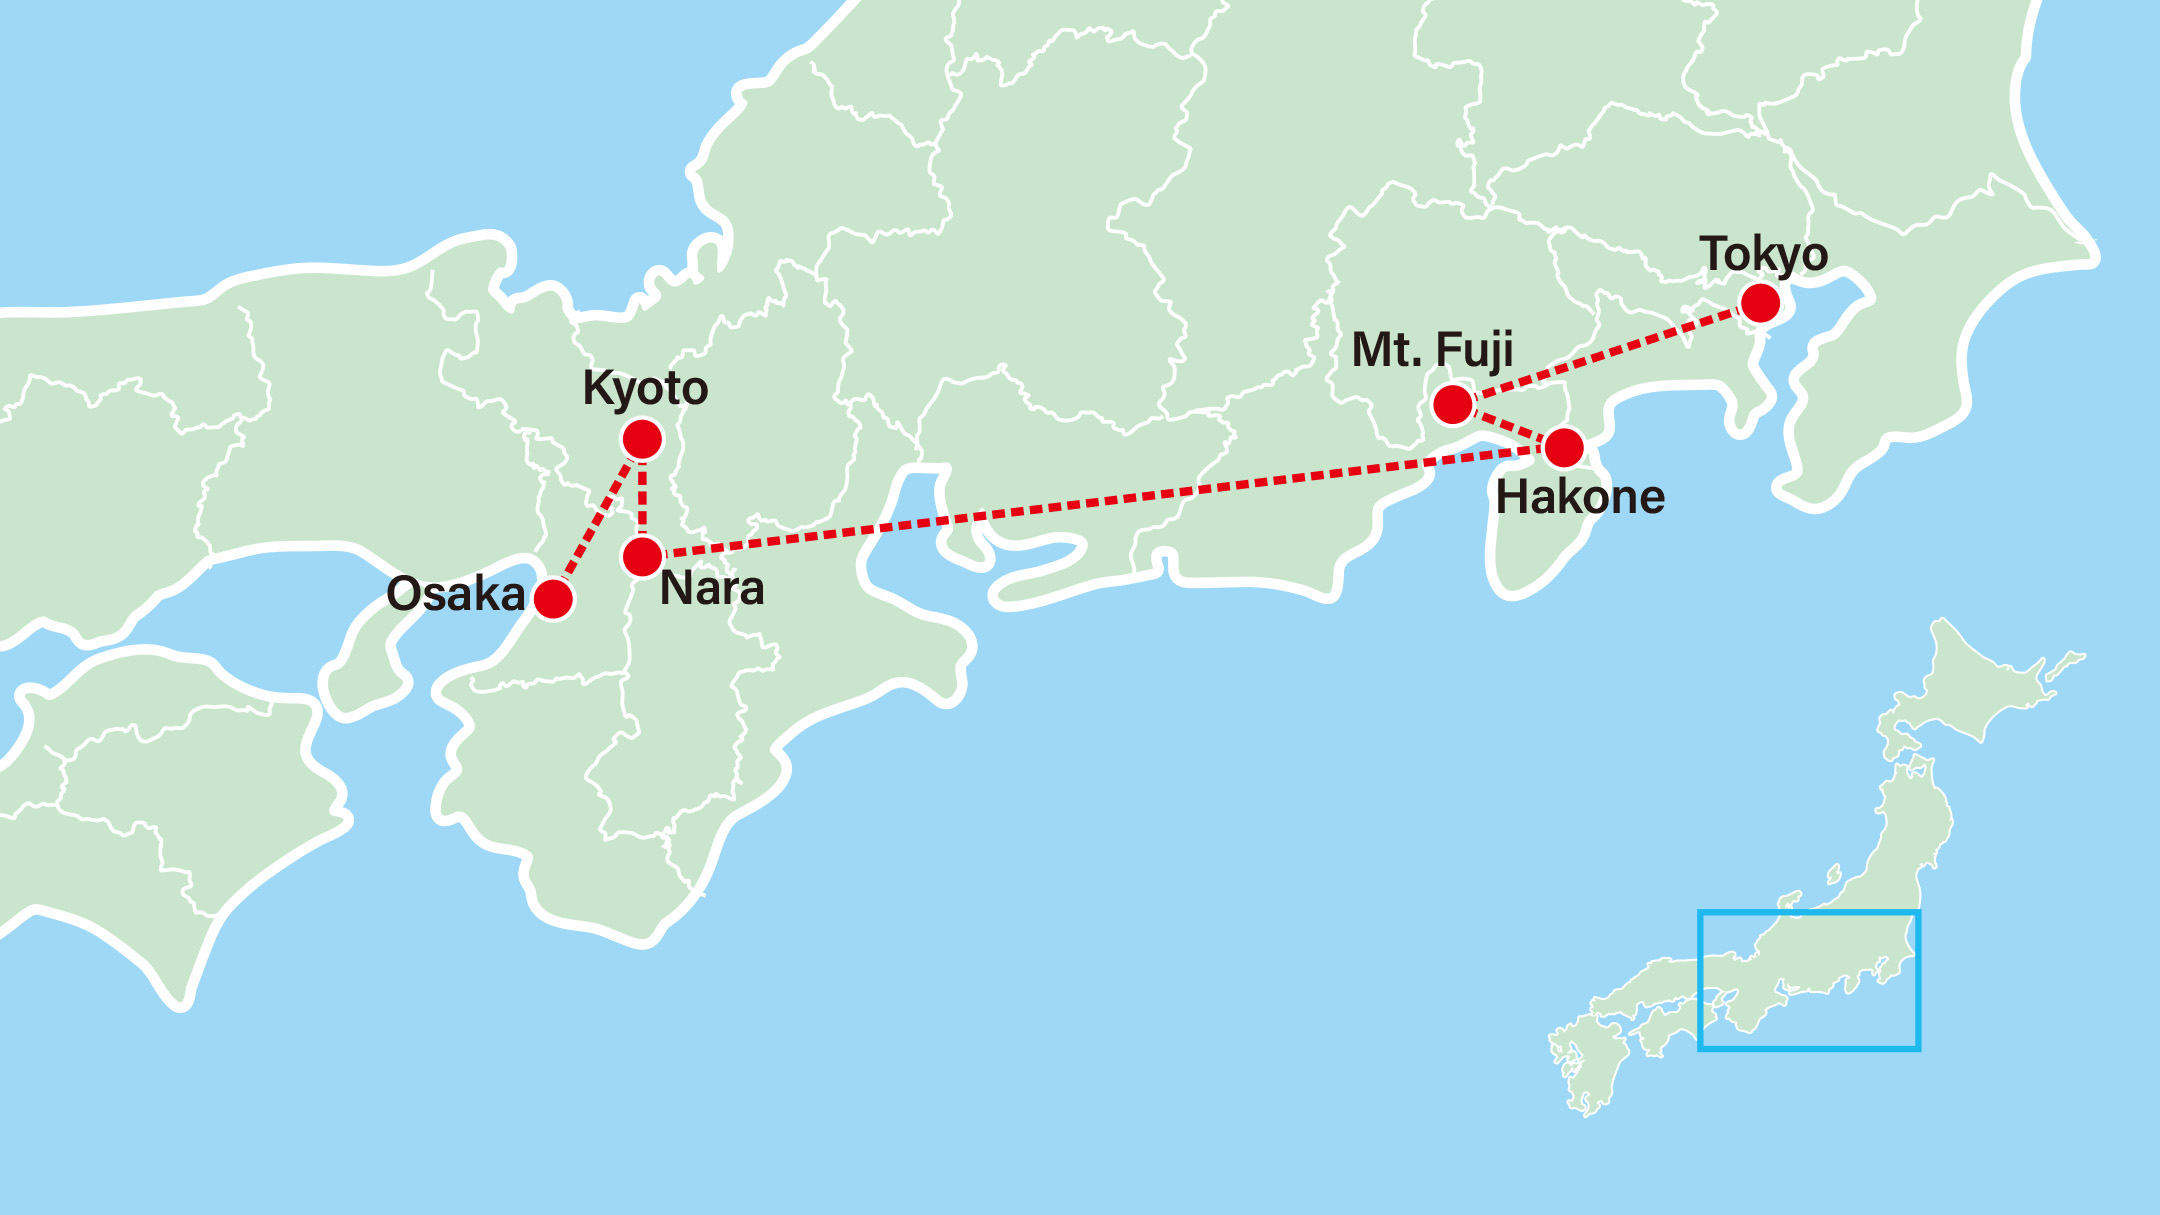 Anime Japan EXPO 2020 9 Days -Kyoto-Nara-Mt. Fuji-Hakone-Tokyo-Yokohama